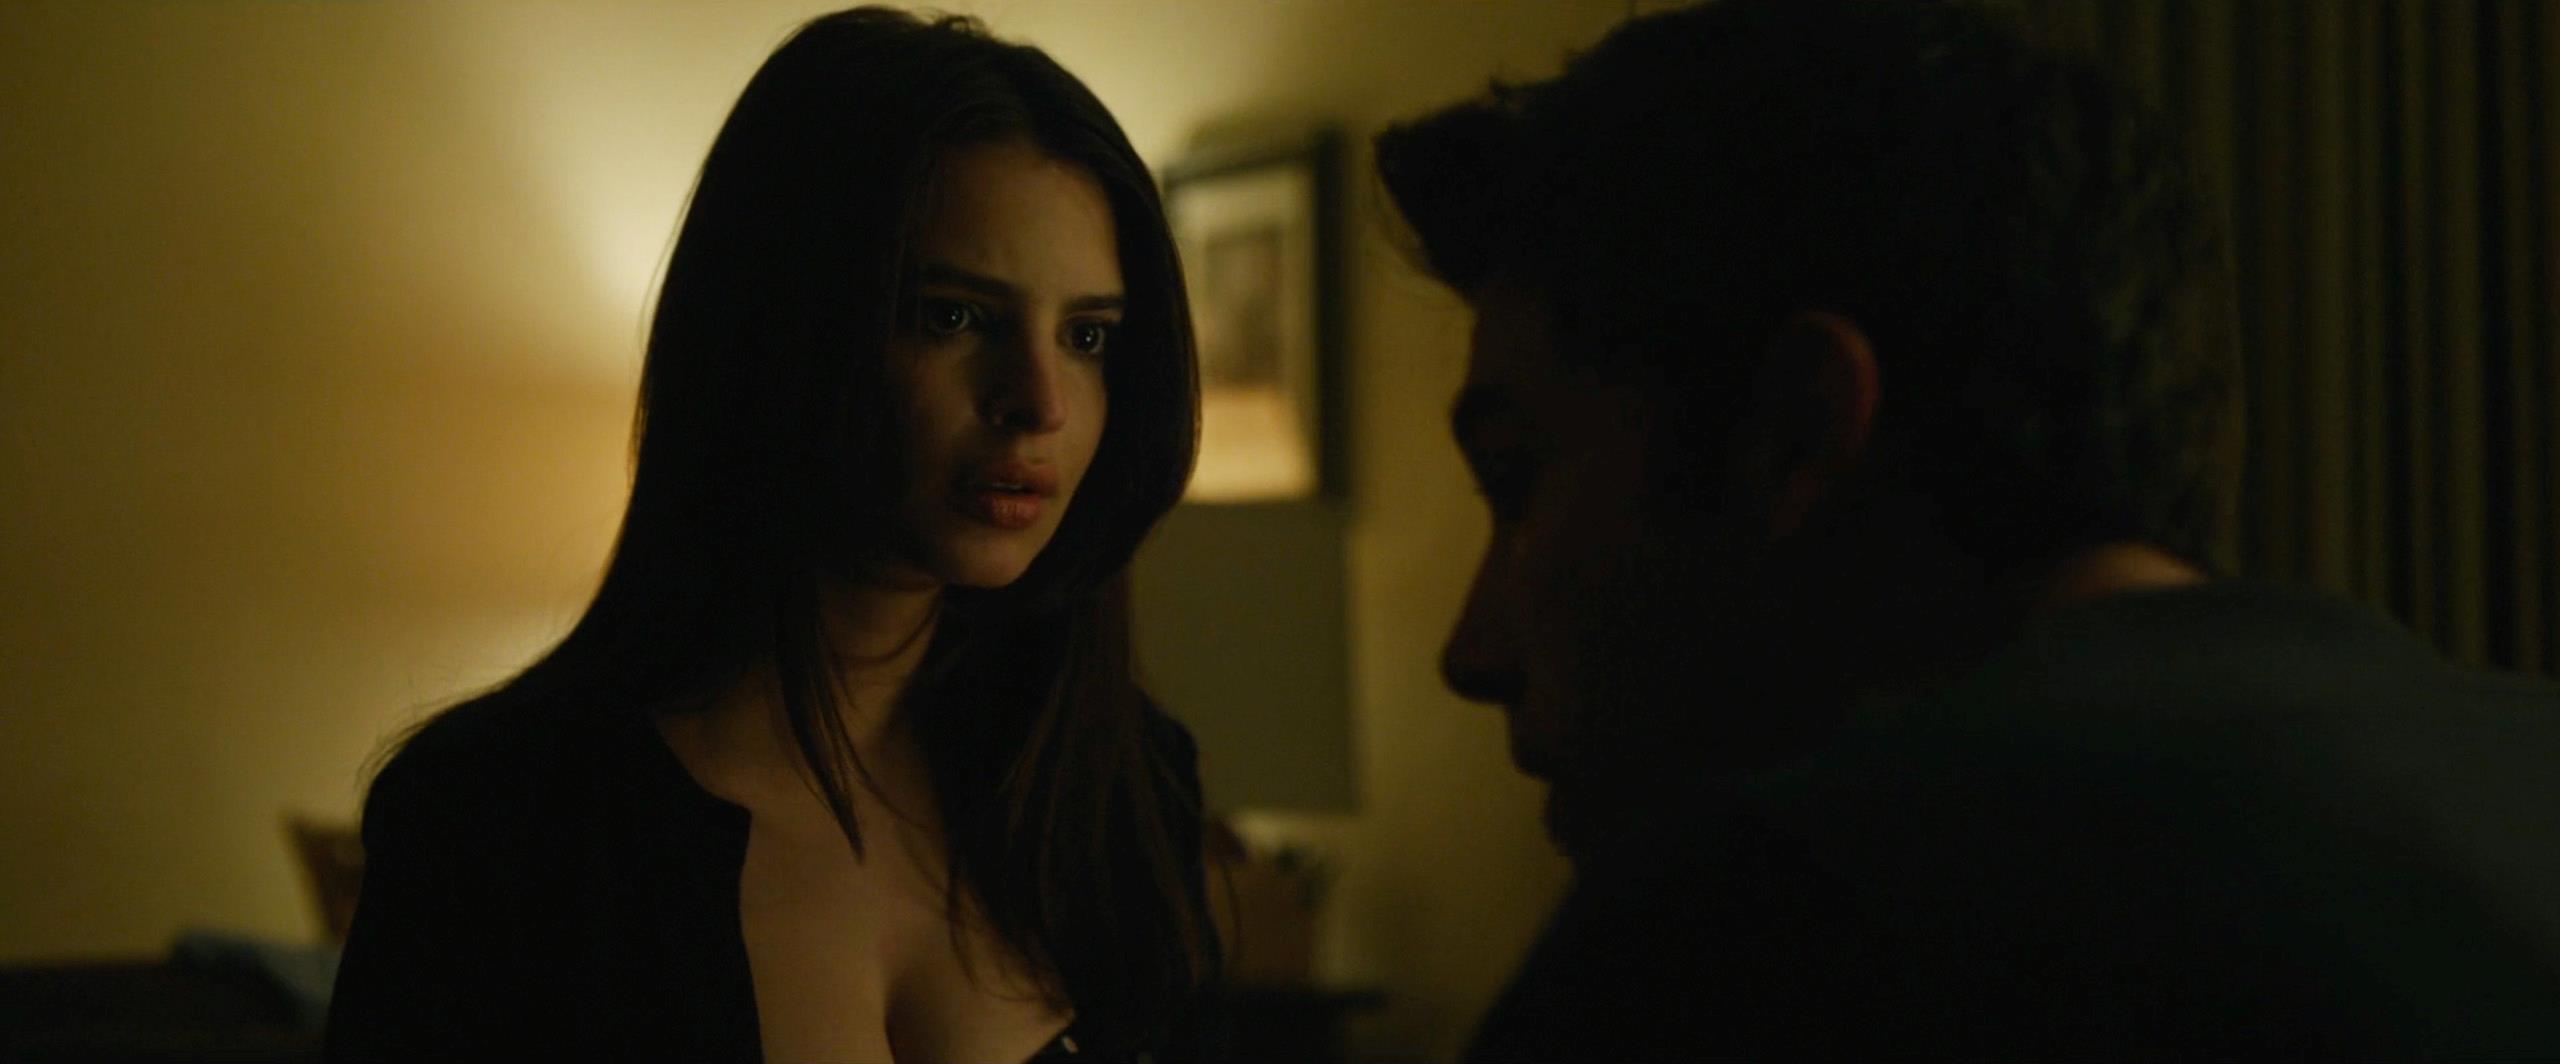 Emily insieme a Ben Affleck in una scena de L'amore bugiardo